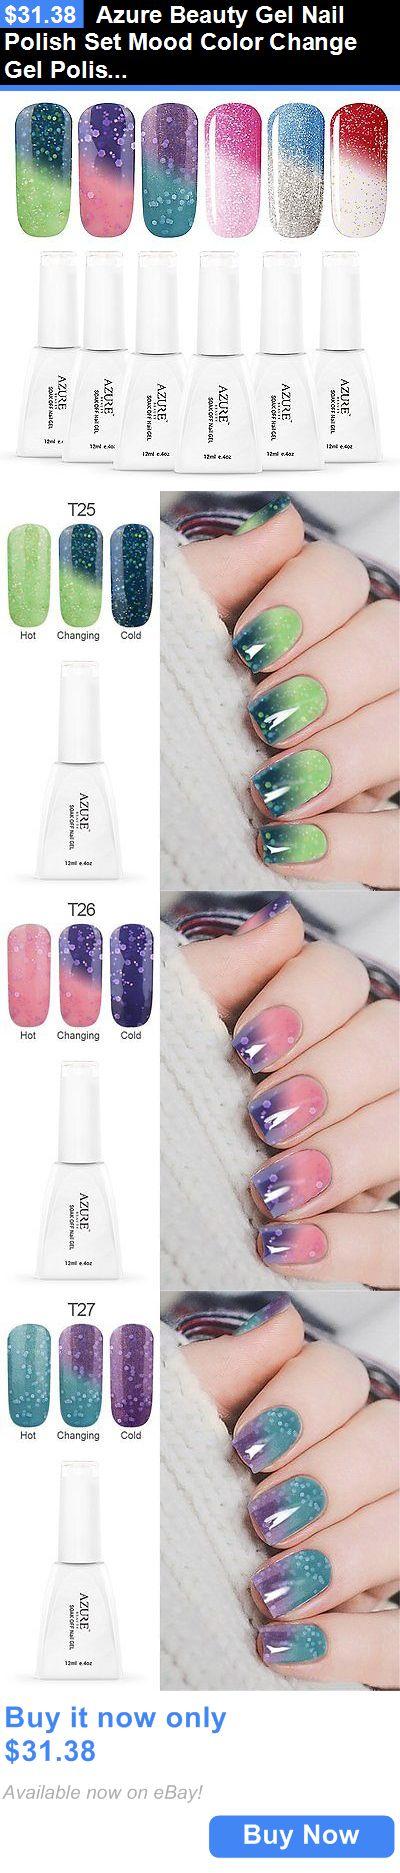 Gel Nails: Azure Beauty Gel Nail Polish Set Mood Color Change Gel Polish  Set,